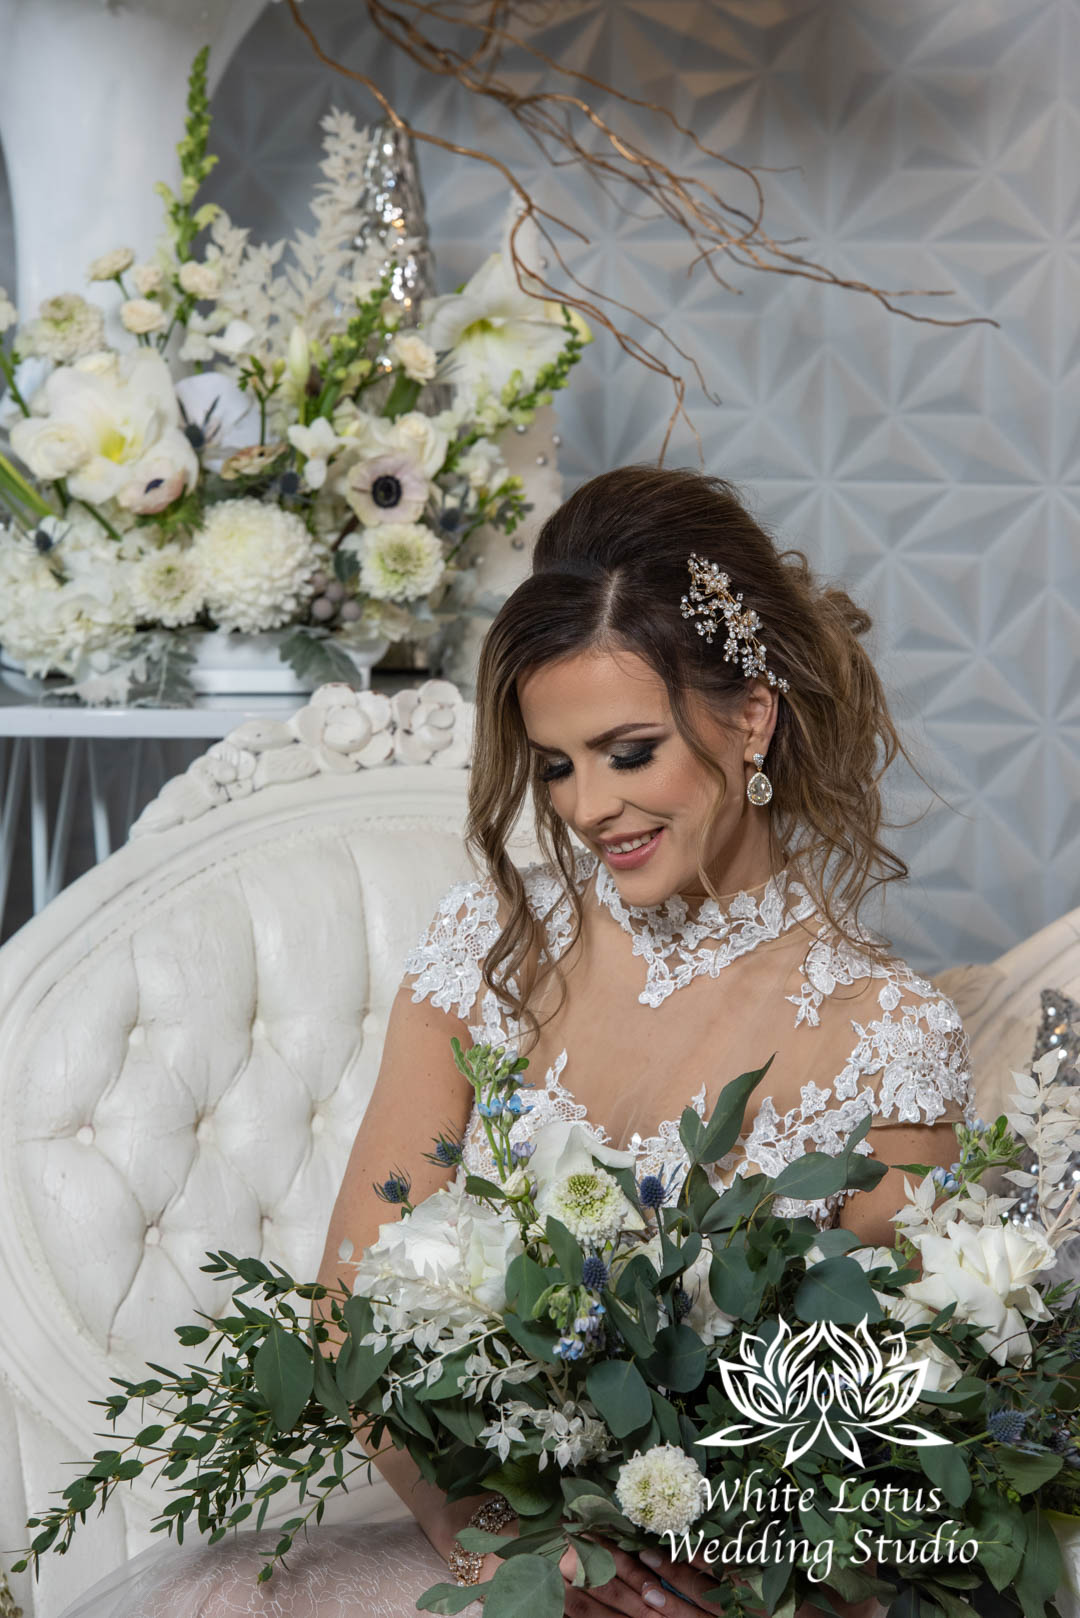 066- GLAM WINTERLUXE WEDDING INSPIRATION